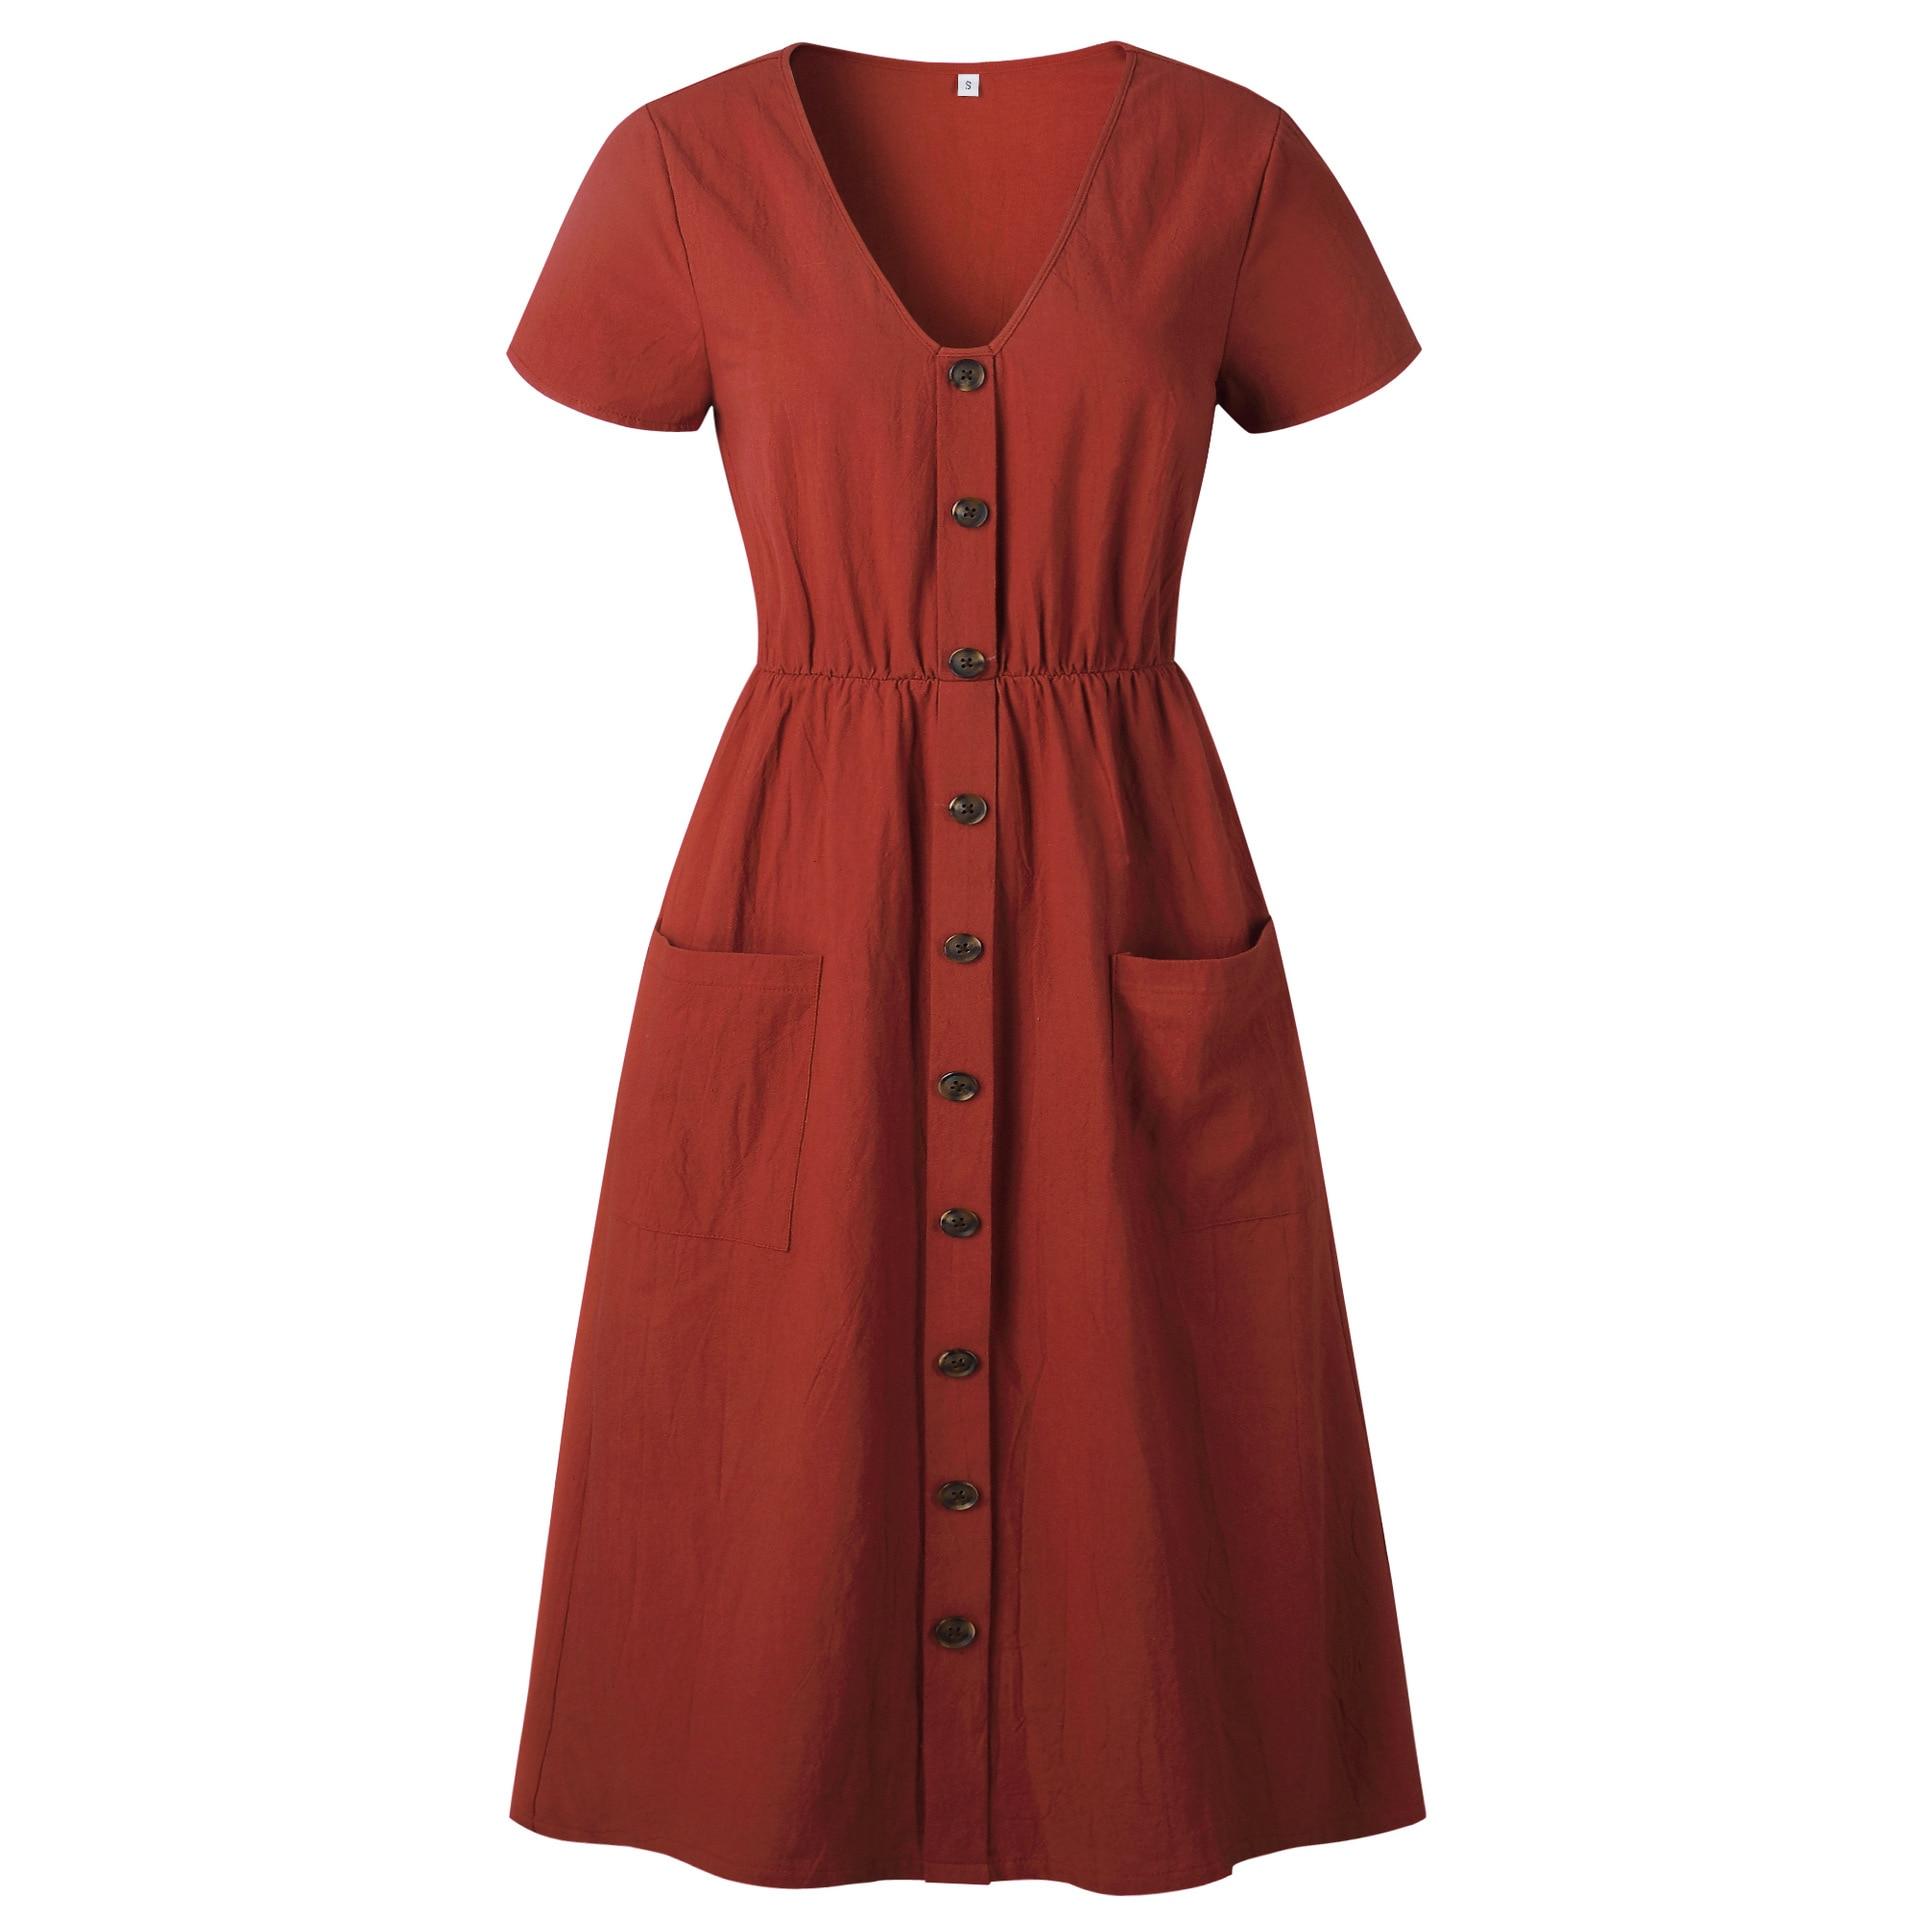 Red Blue A Line Casual Dresses Women Autumn Dress 19 Vintage Long Sleeve Dress For Ladies Buttons V Neck Midi Vestidos Female 106